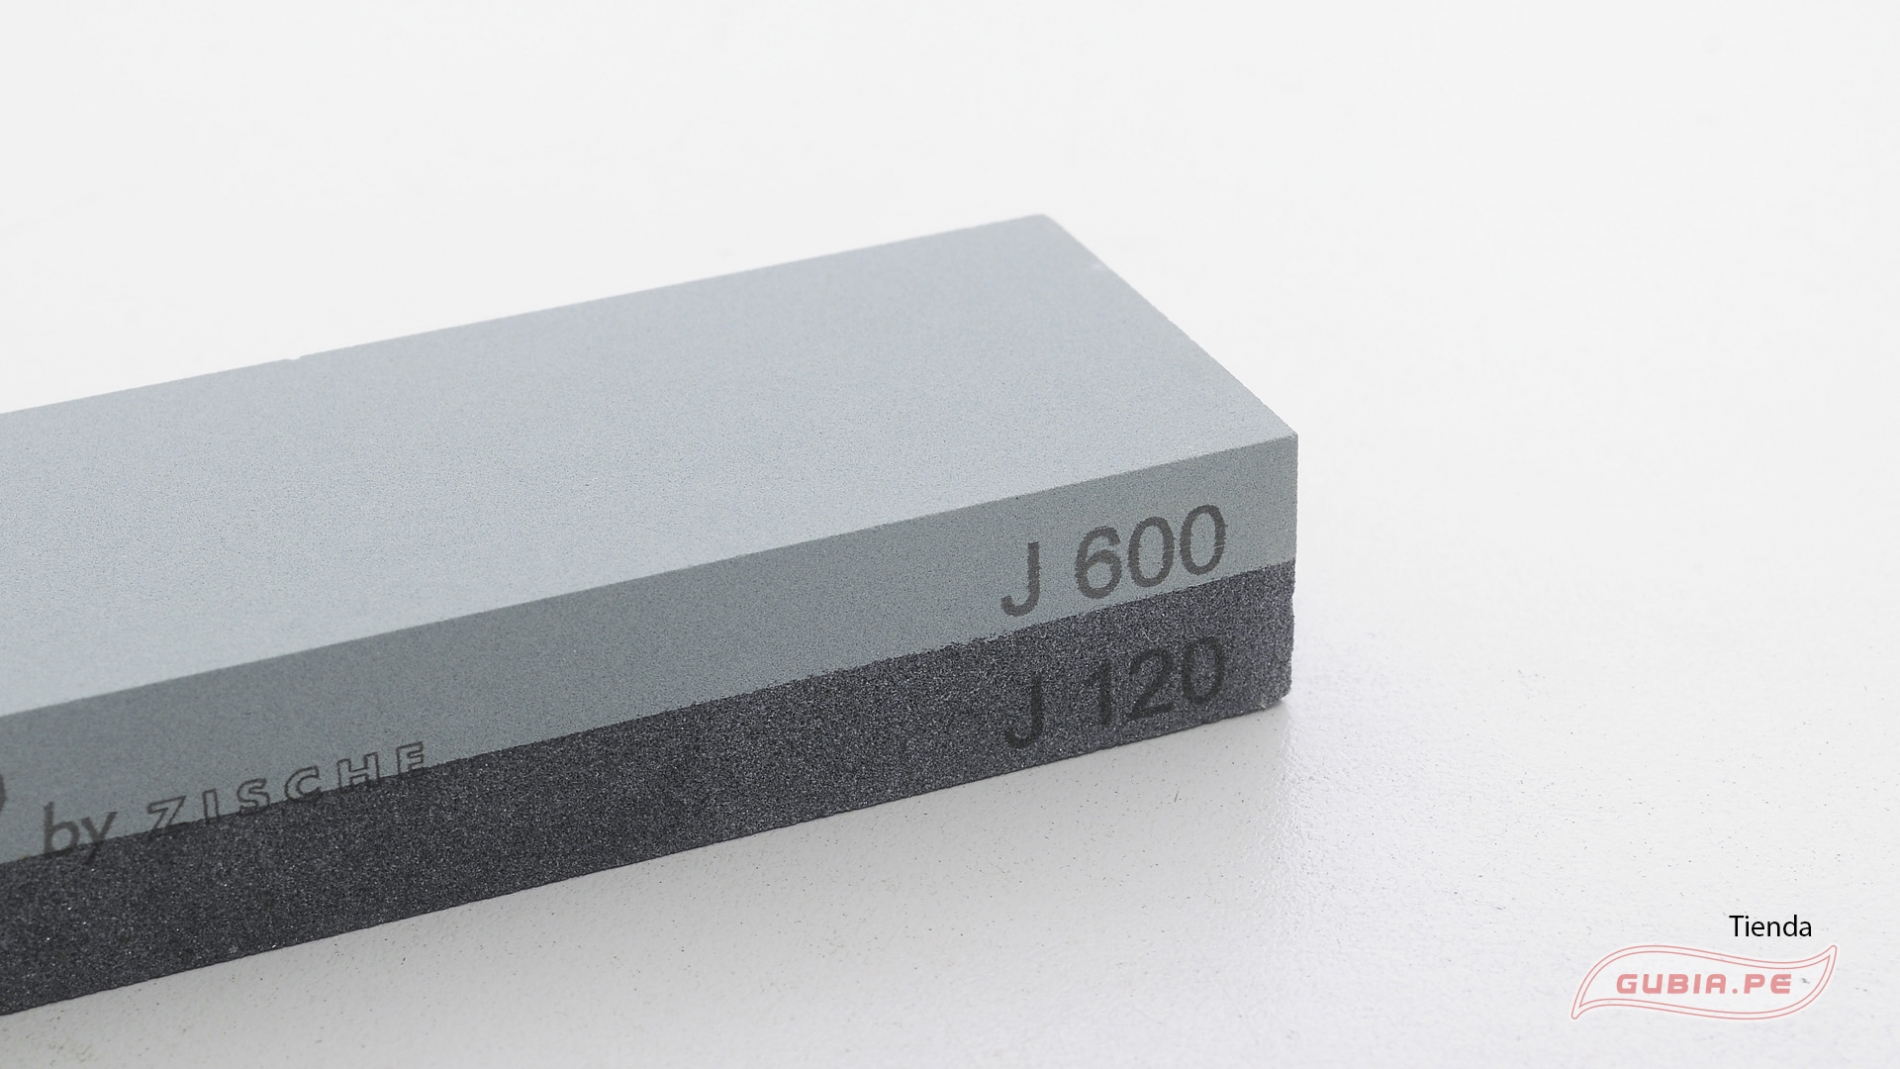 Zische120/600-Afilador de cuchillos grano 120/600 Silifix 150x50x25mm Zische-max-2.